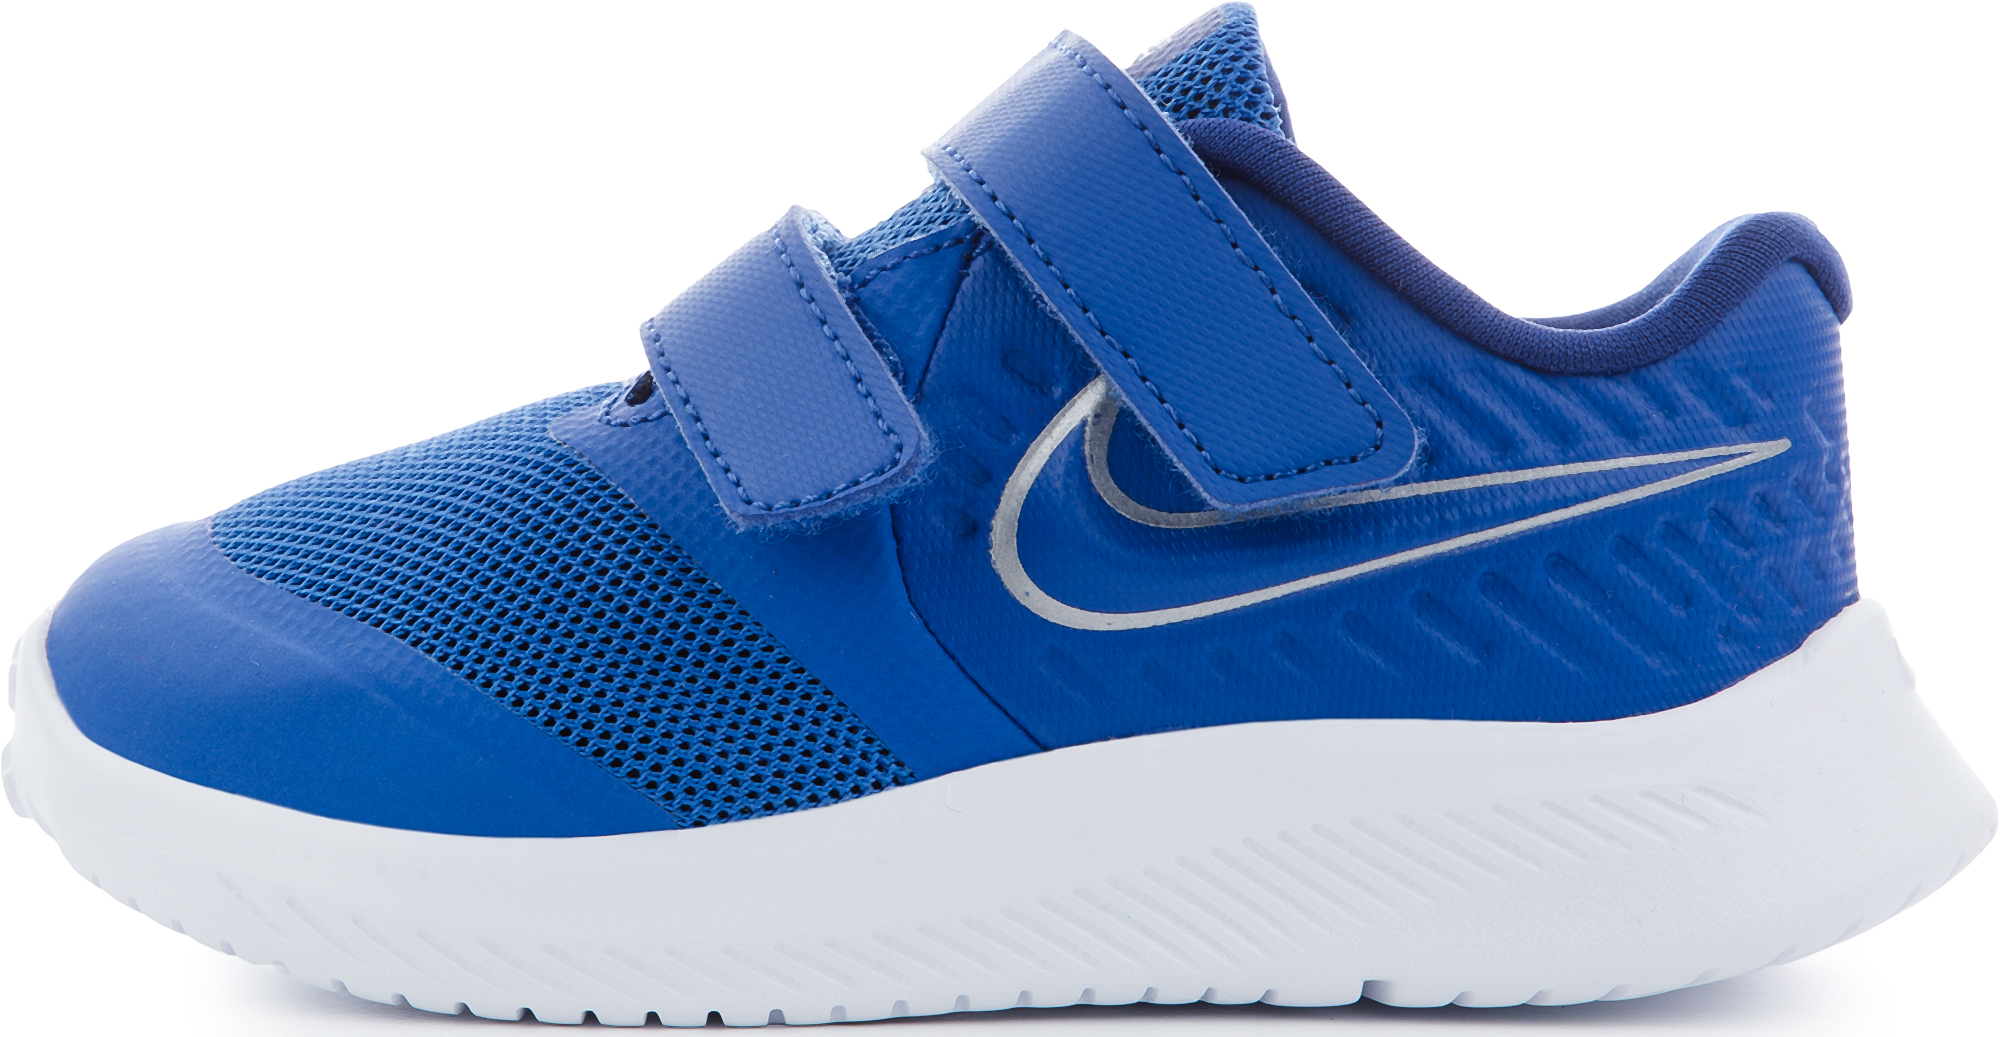 Nike Кроссовки для мальчиков Nike Star Runner 2, размер 26 nike кроссовки для мальчиков nike lunar hayward размер 37 5